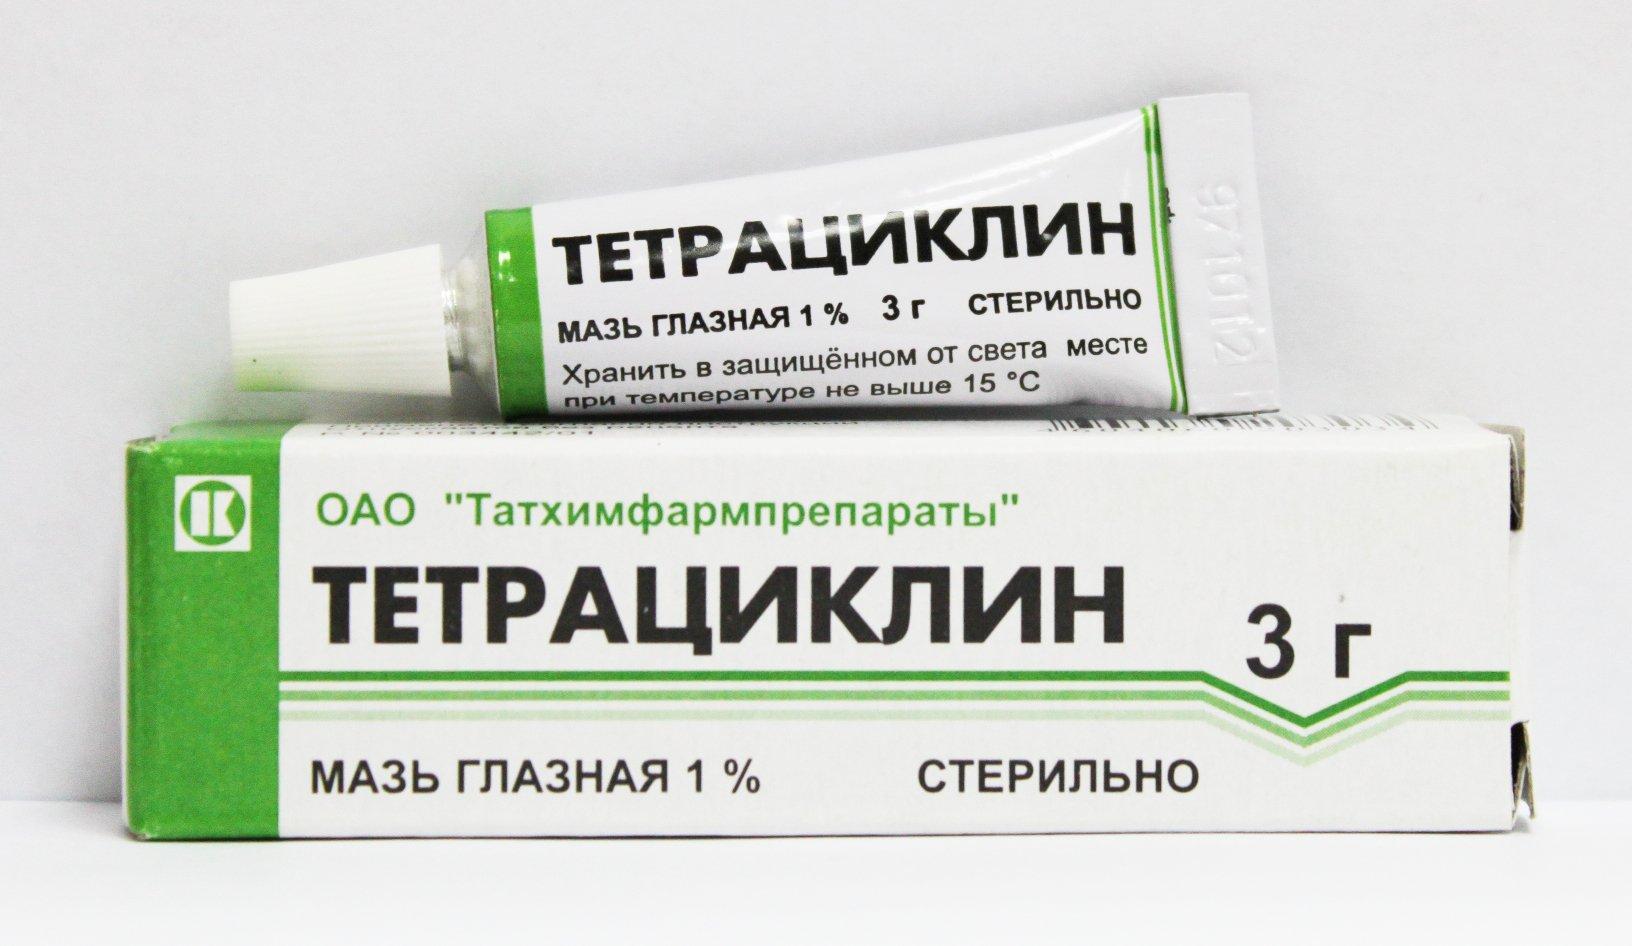 Мазь глазная тетрациклиновая